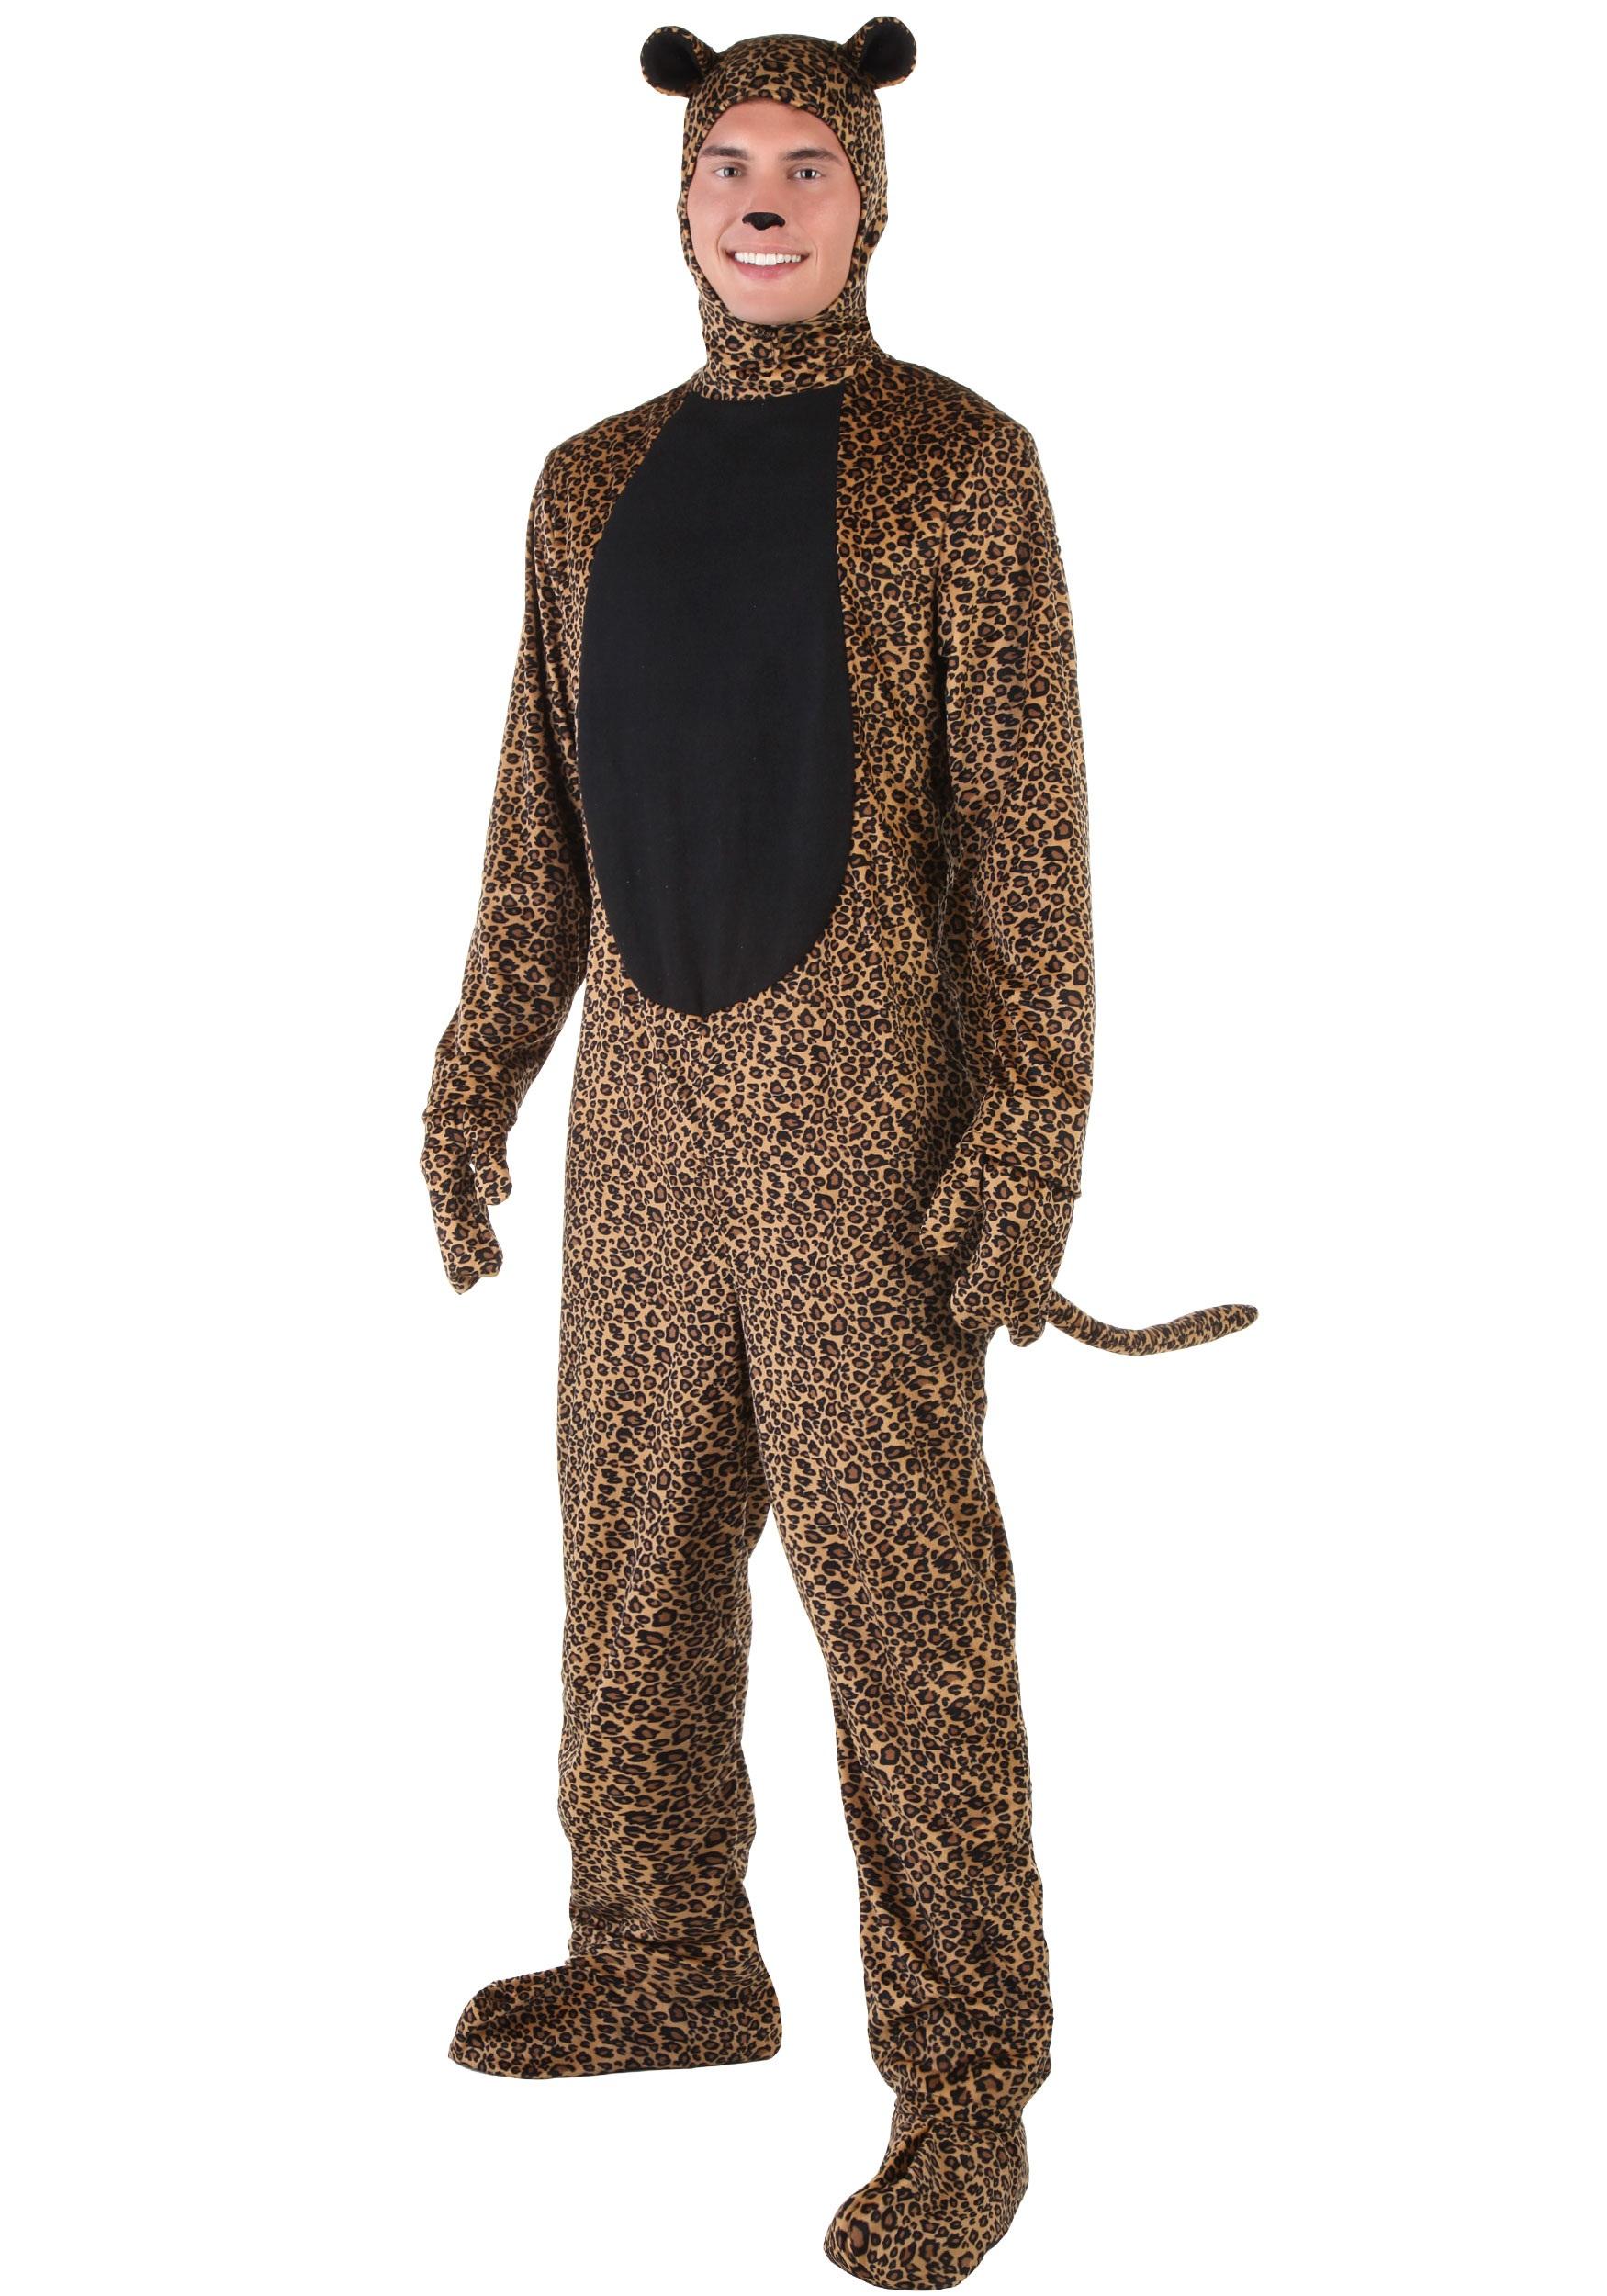 Adult Leopard Costume  sc 1 st  Halloween Costumes & Adult Leopard Costume - Halloween Costumes